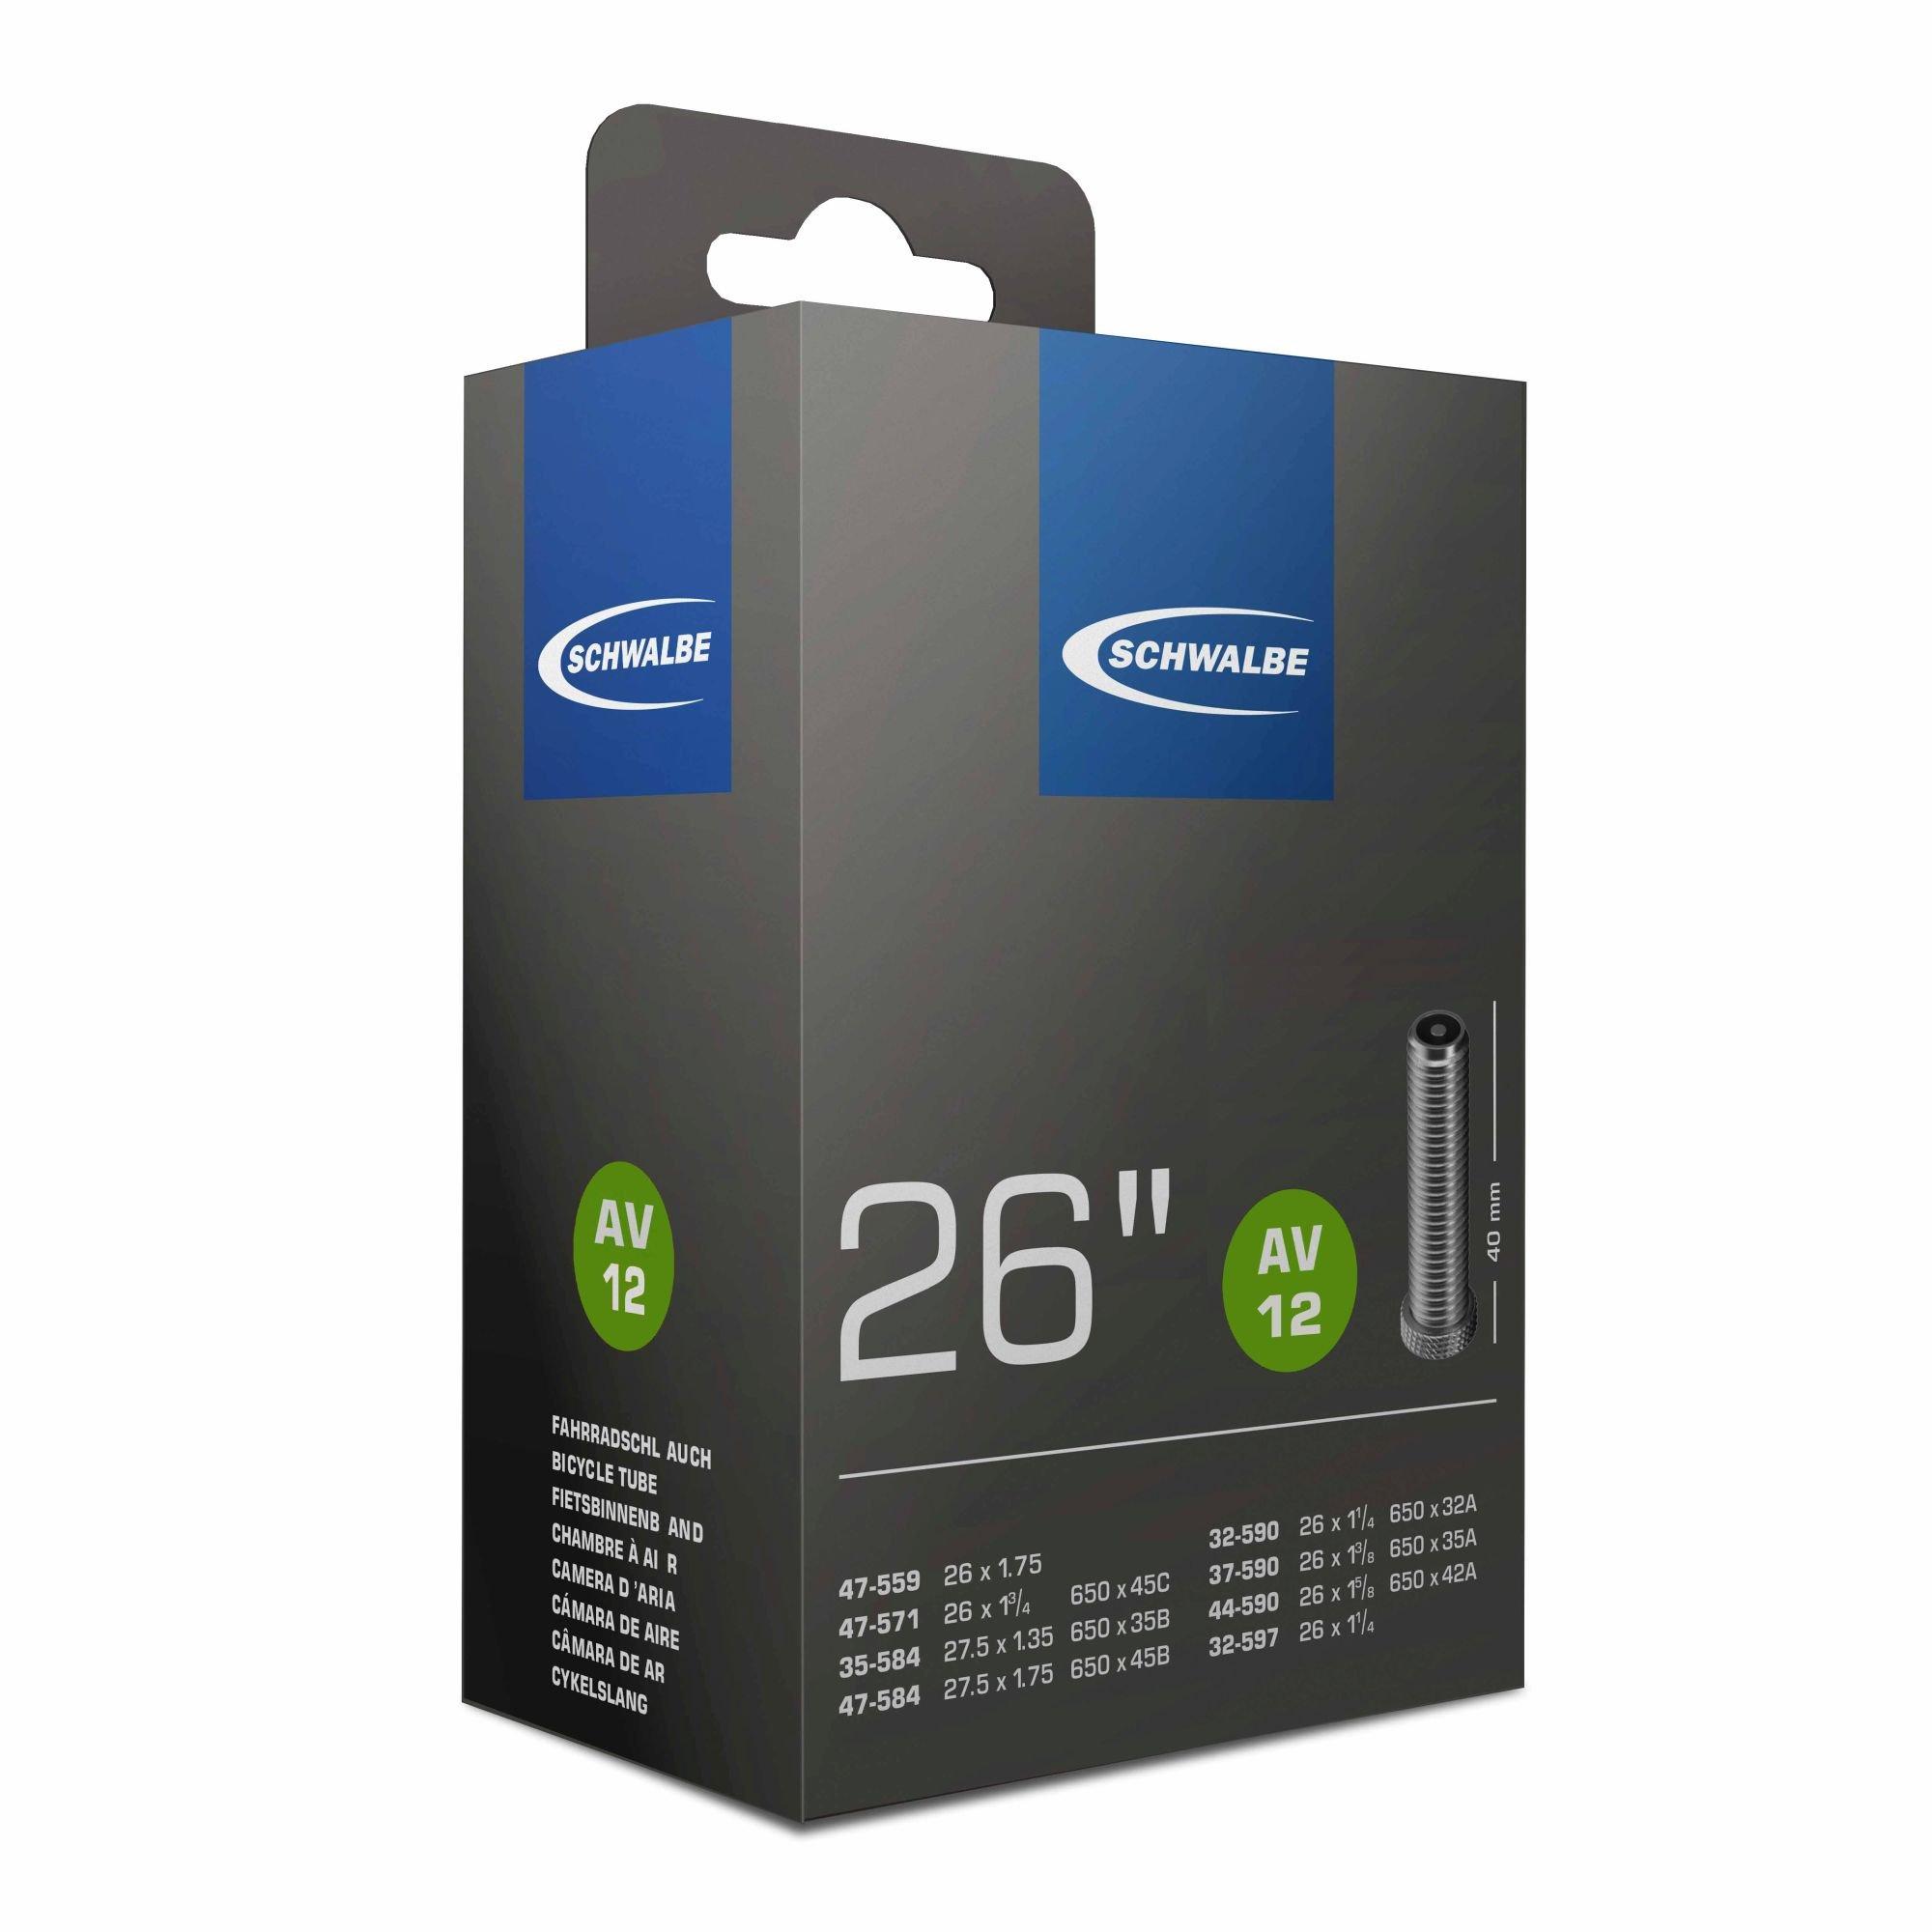 schläuche/Bereifung: Schwalbe  Fahrradschlauch AV 12  40mm